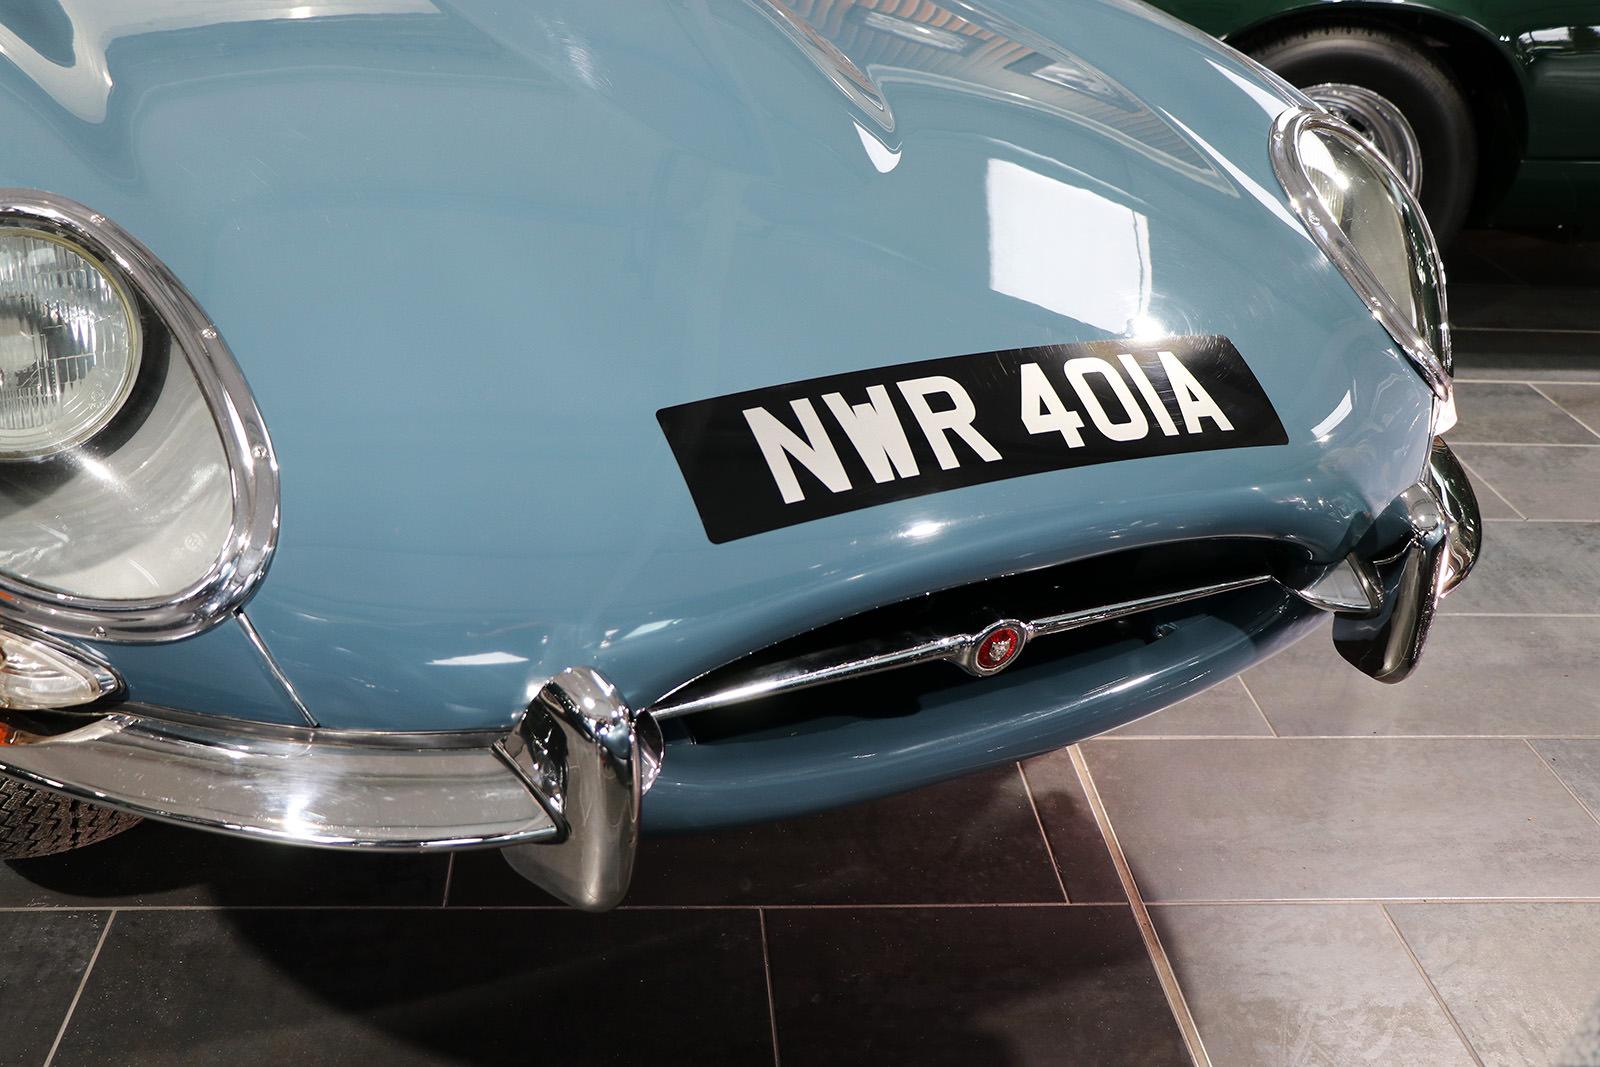 1963_cotswold_blue_series 1_jaguar_etype_sayer_selection_wilkinson_web_4.jpg